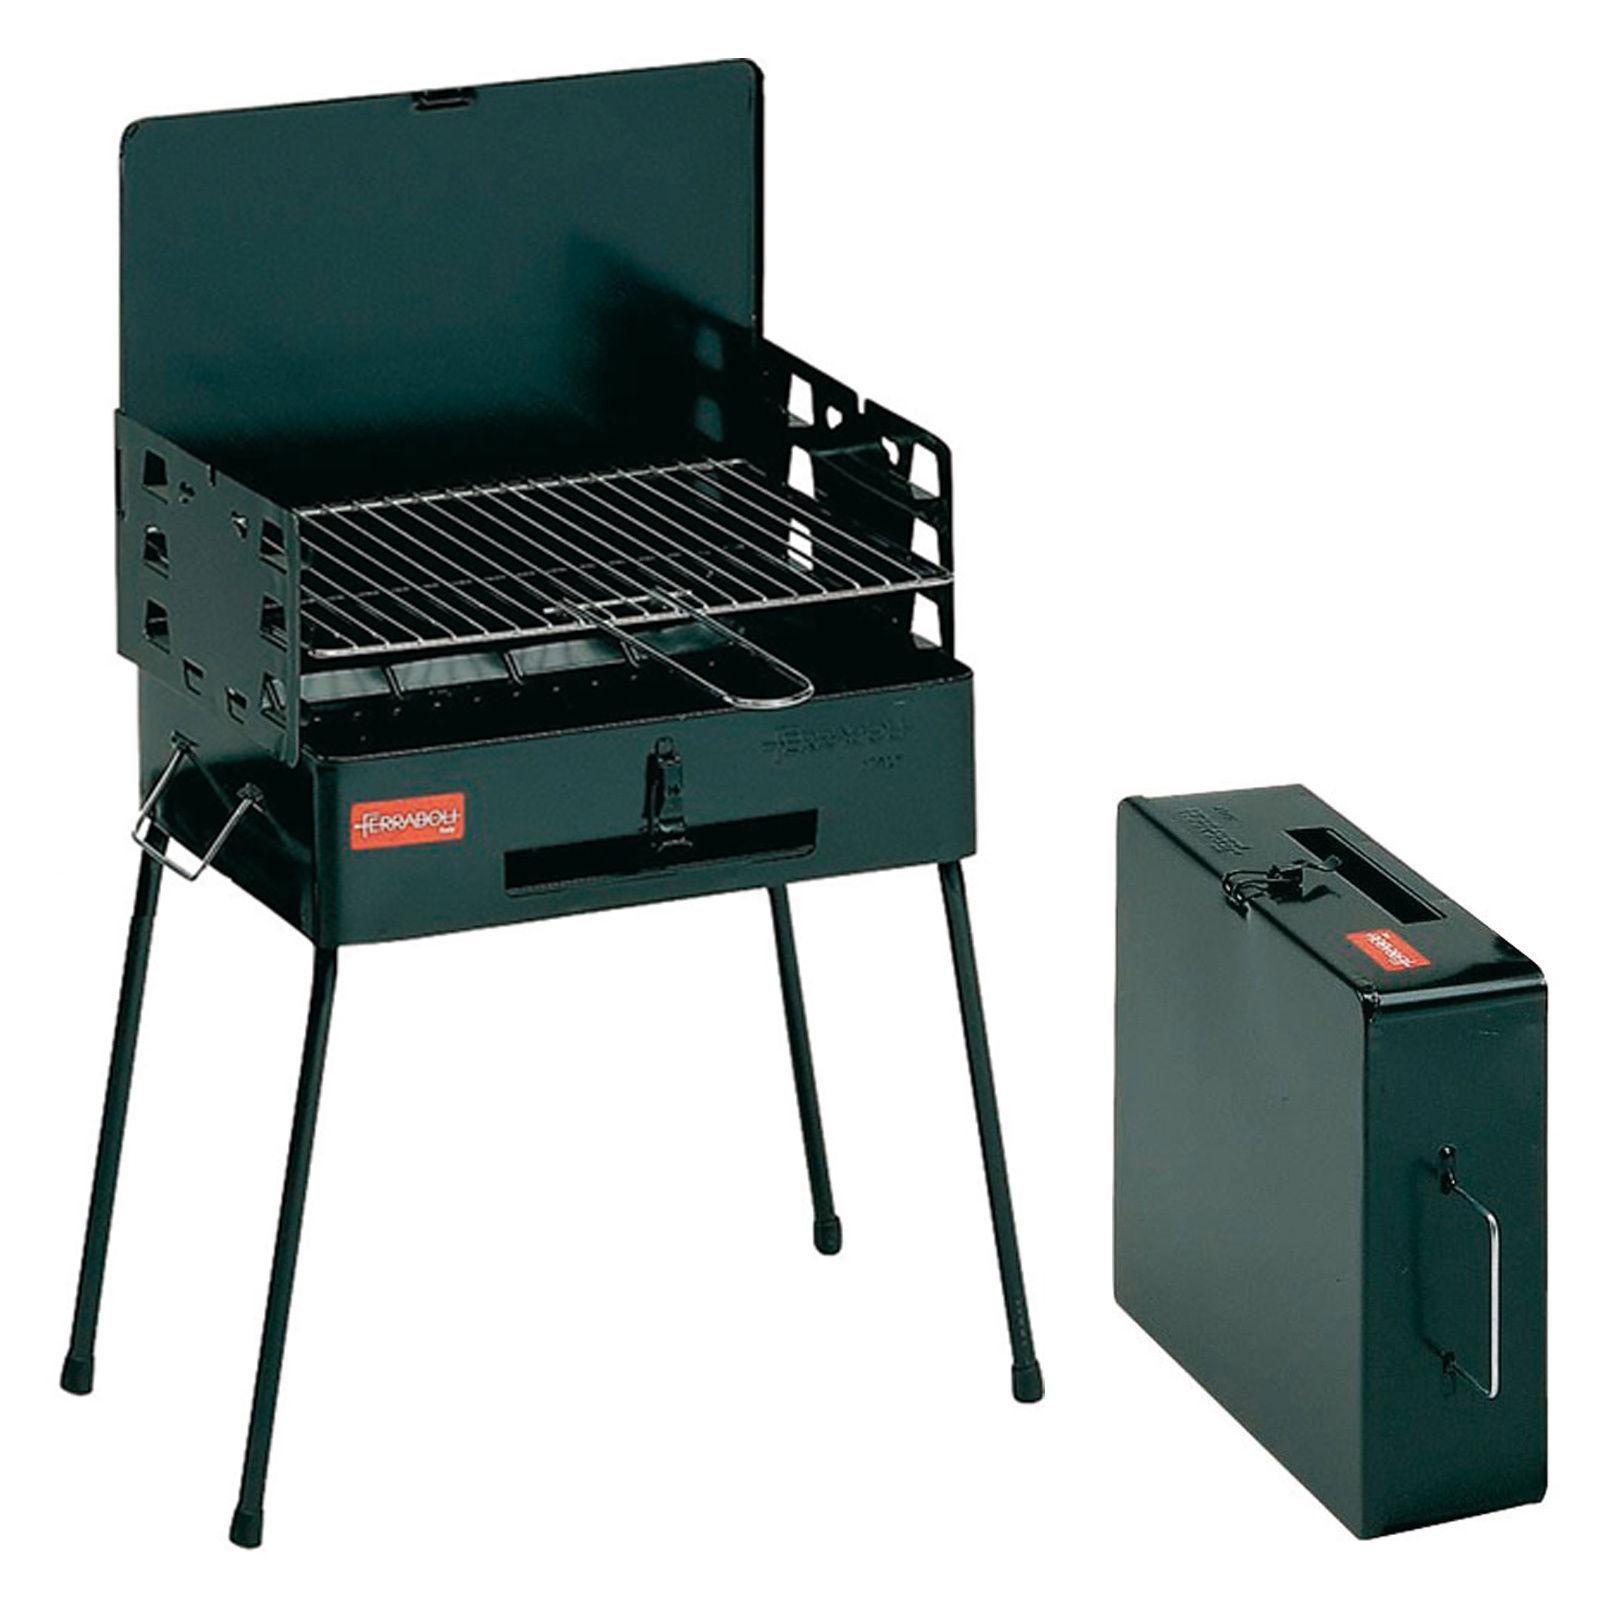 ferraboli koffergrill -camping grill holzkohlegrill klappgrill